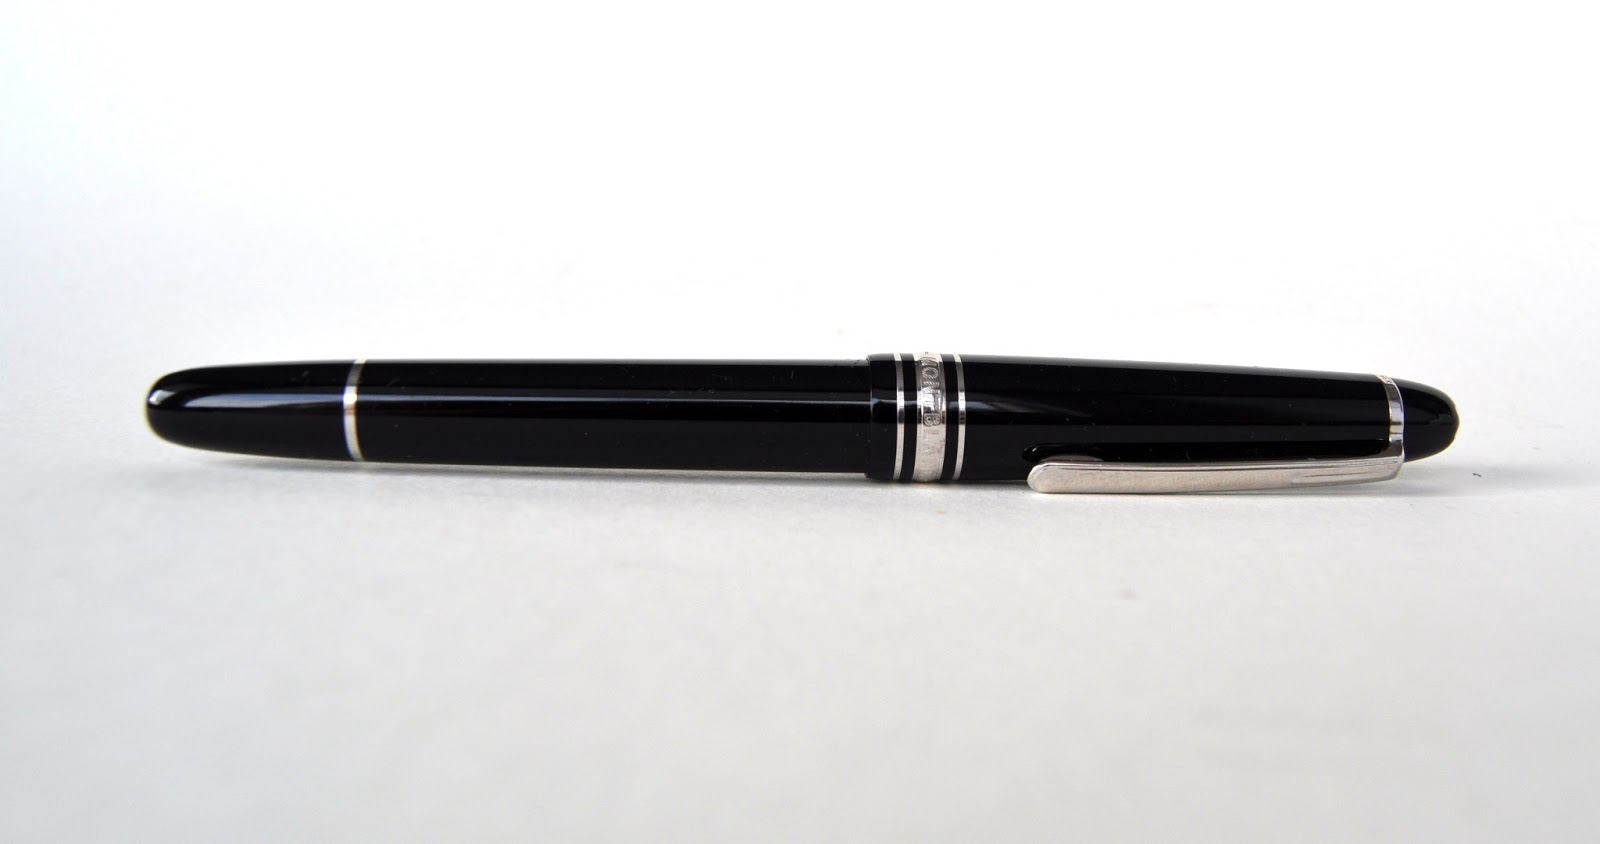 montblanc meisterst ck classique platinum fountain pen. Black Bedroom Furniture Sets. Home Design Ideas